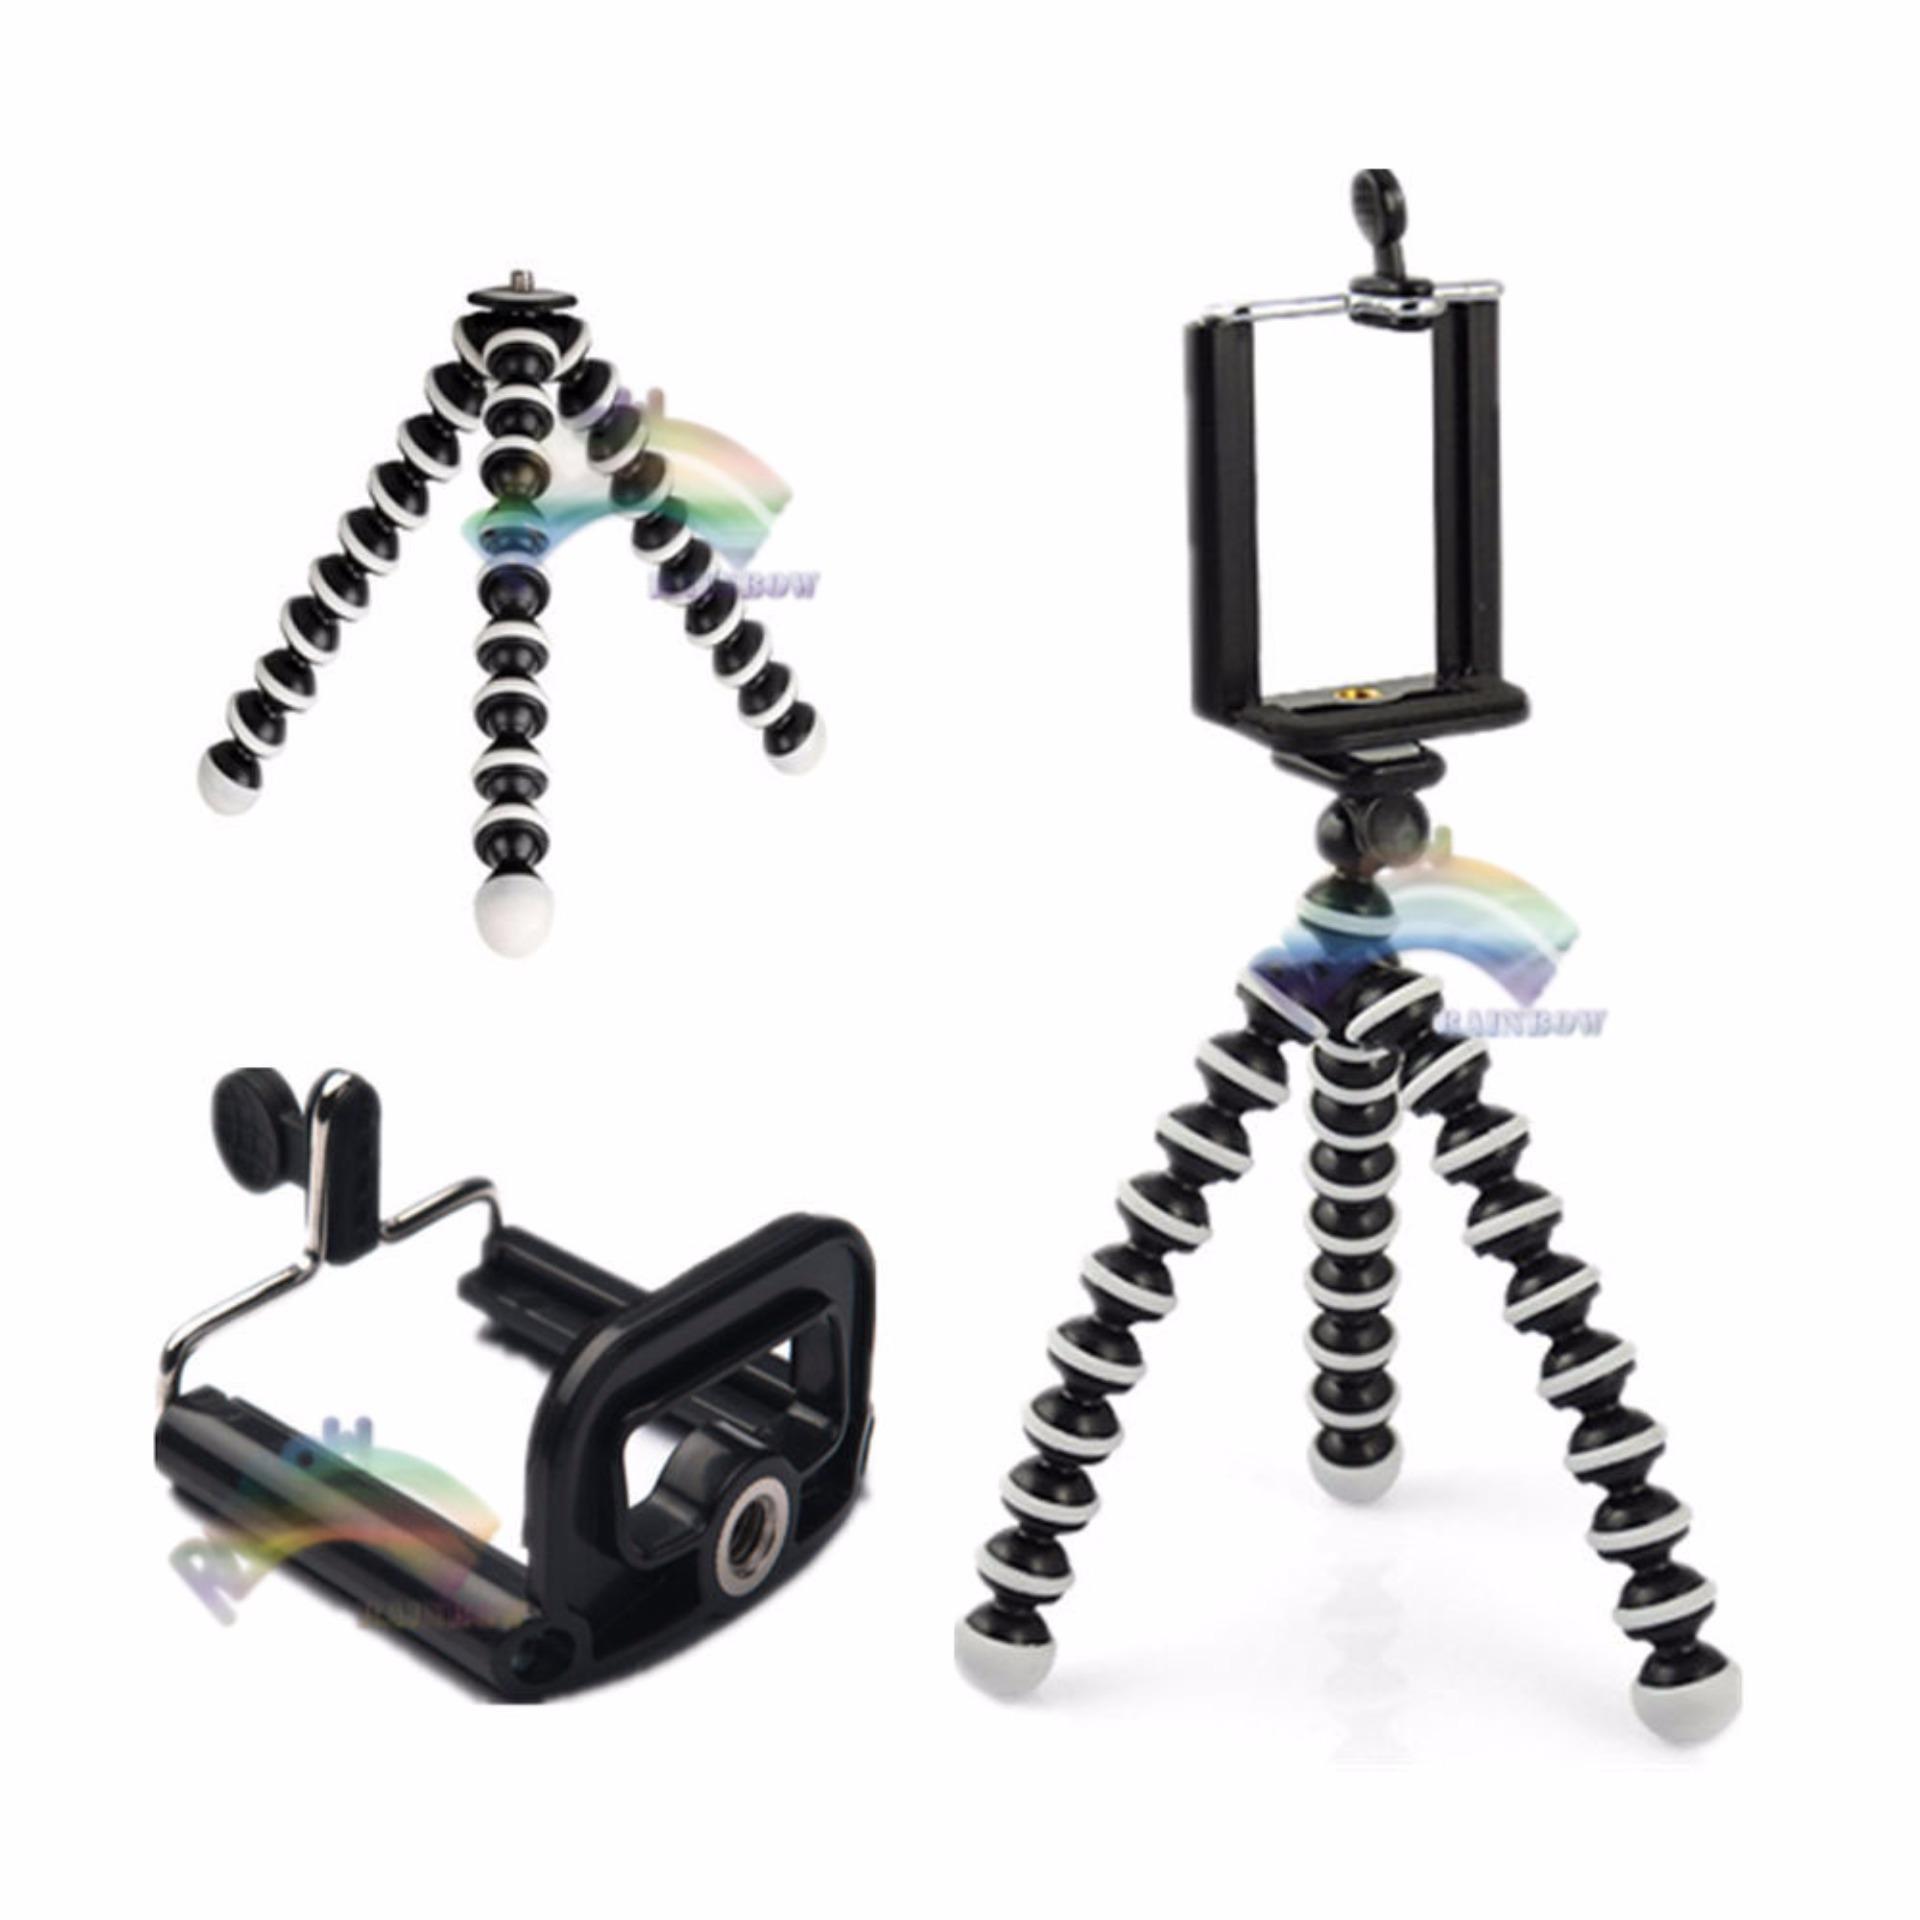 Rainbow Tripod Gurita Mini Spiral Kaki Tiga Untuk Smartphone 6inch, Webcam, Small Camera ...